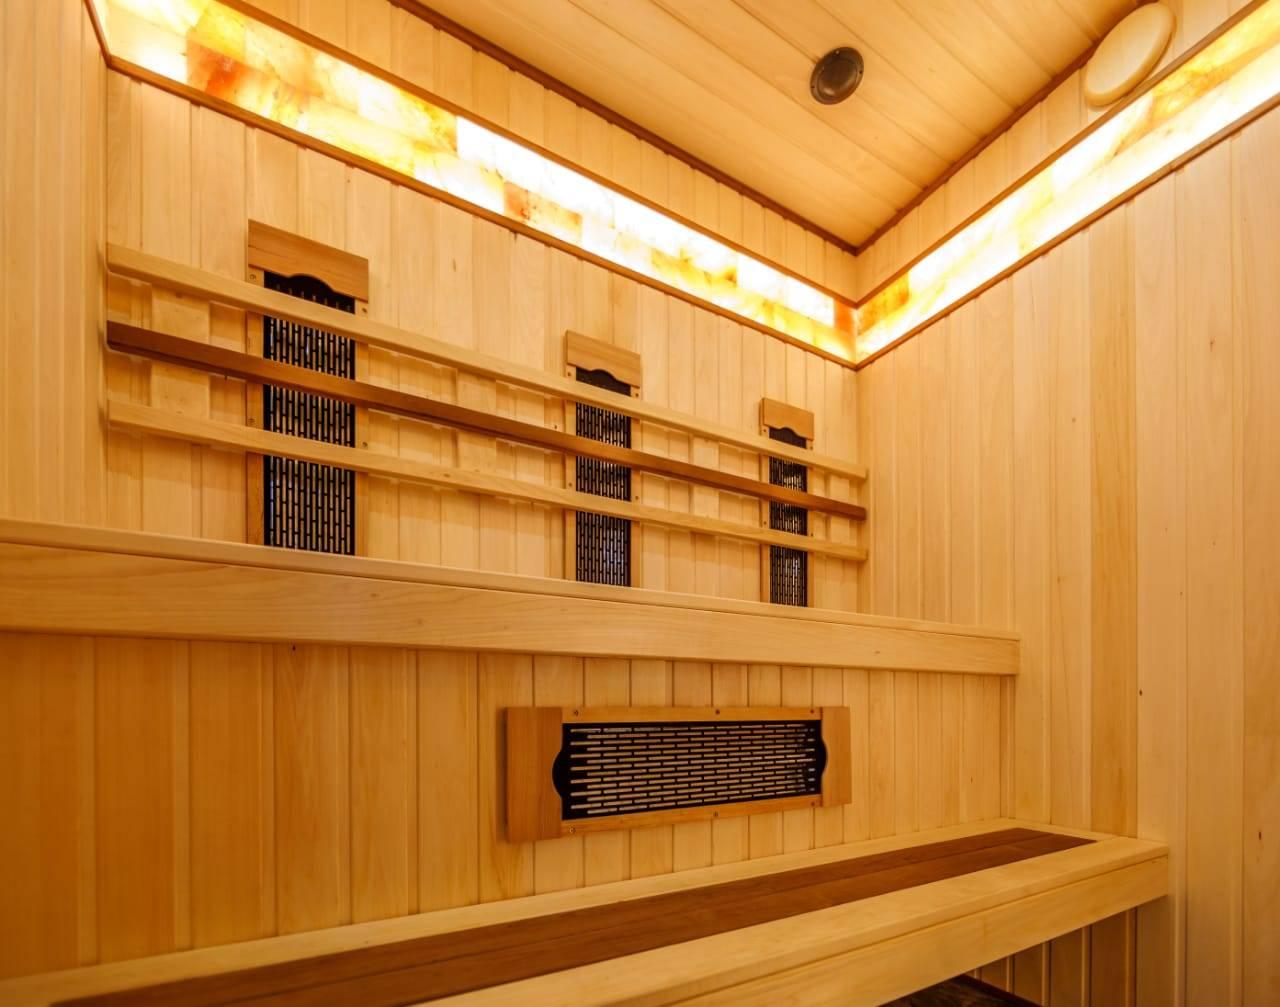 Обогреватели для бани: ик обогреватели, выбор, установка